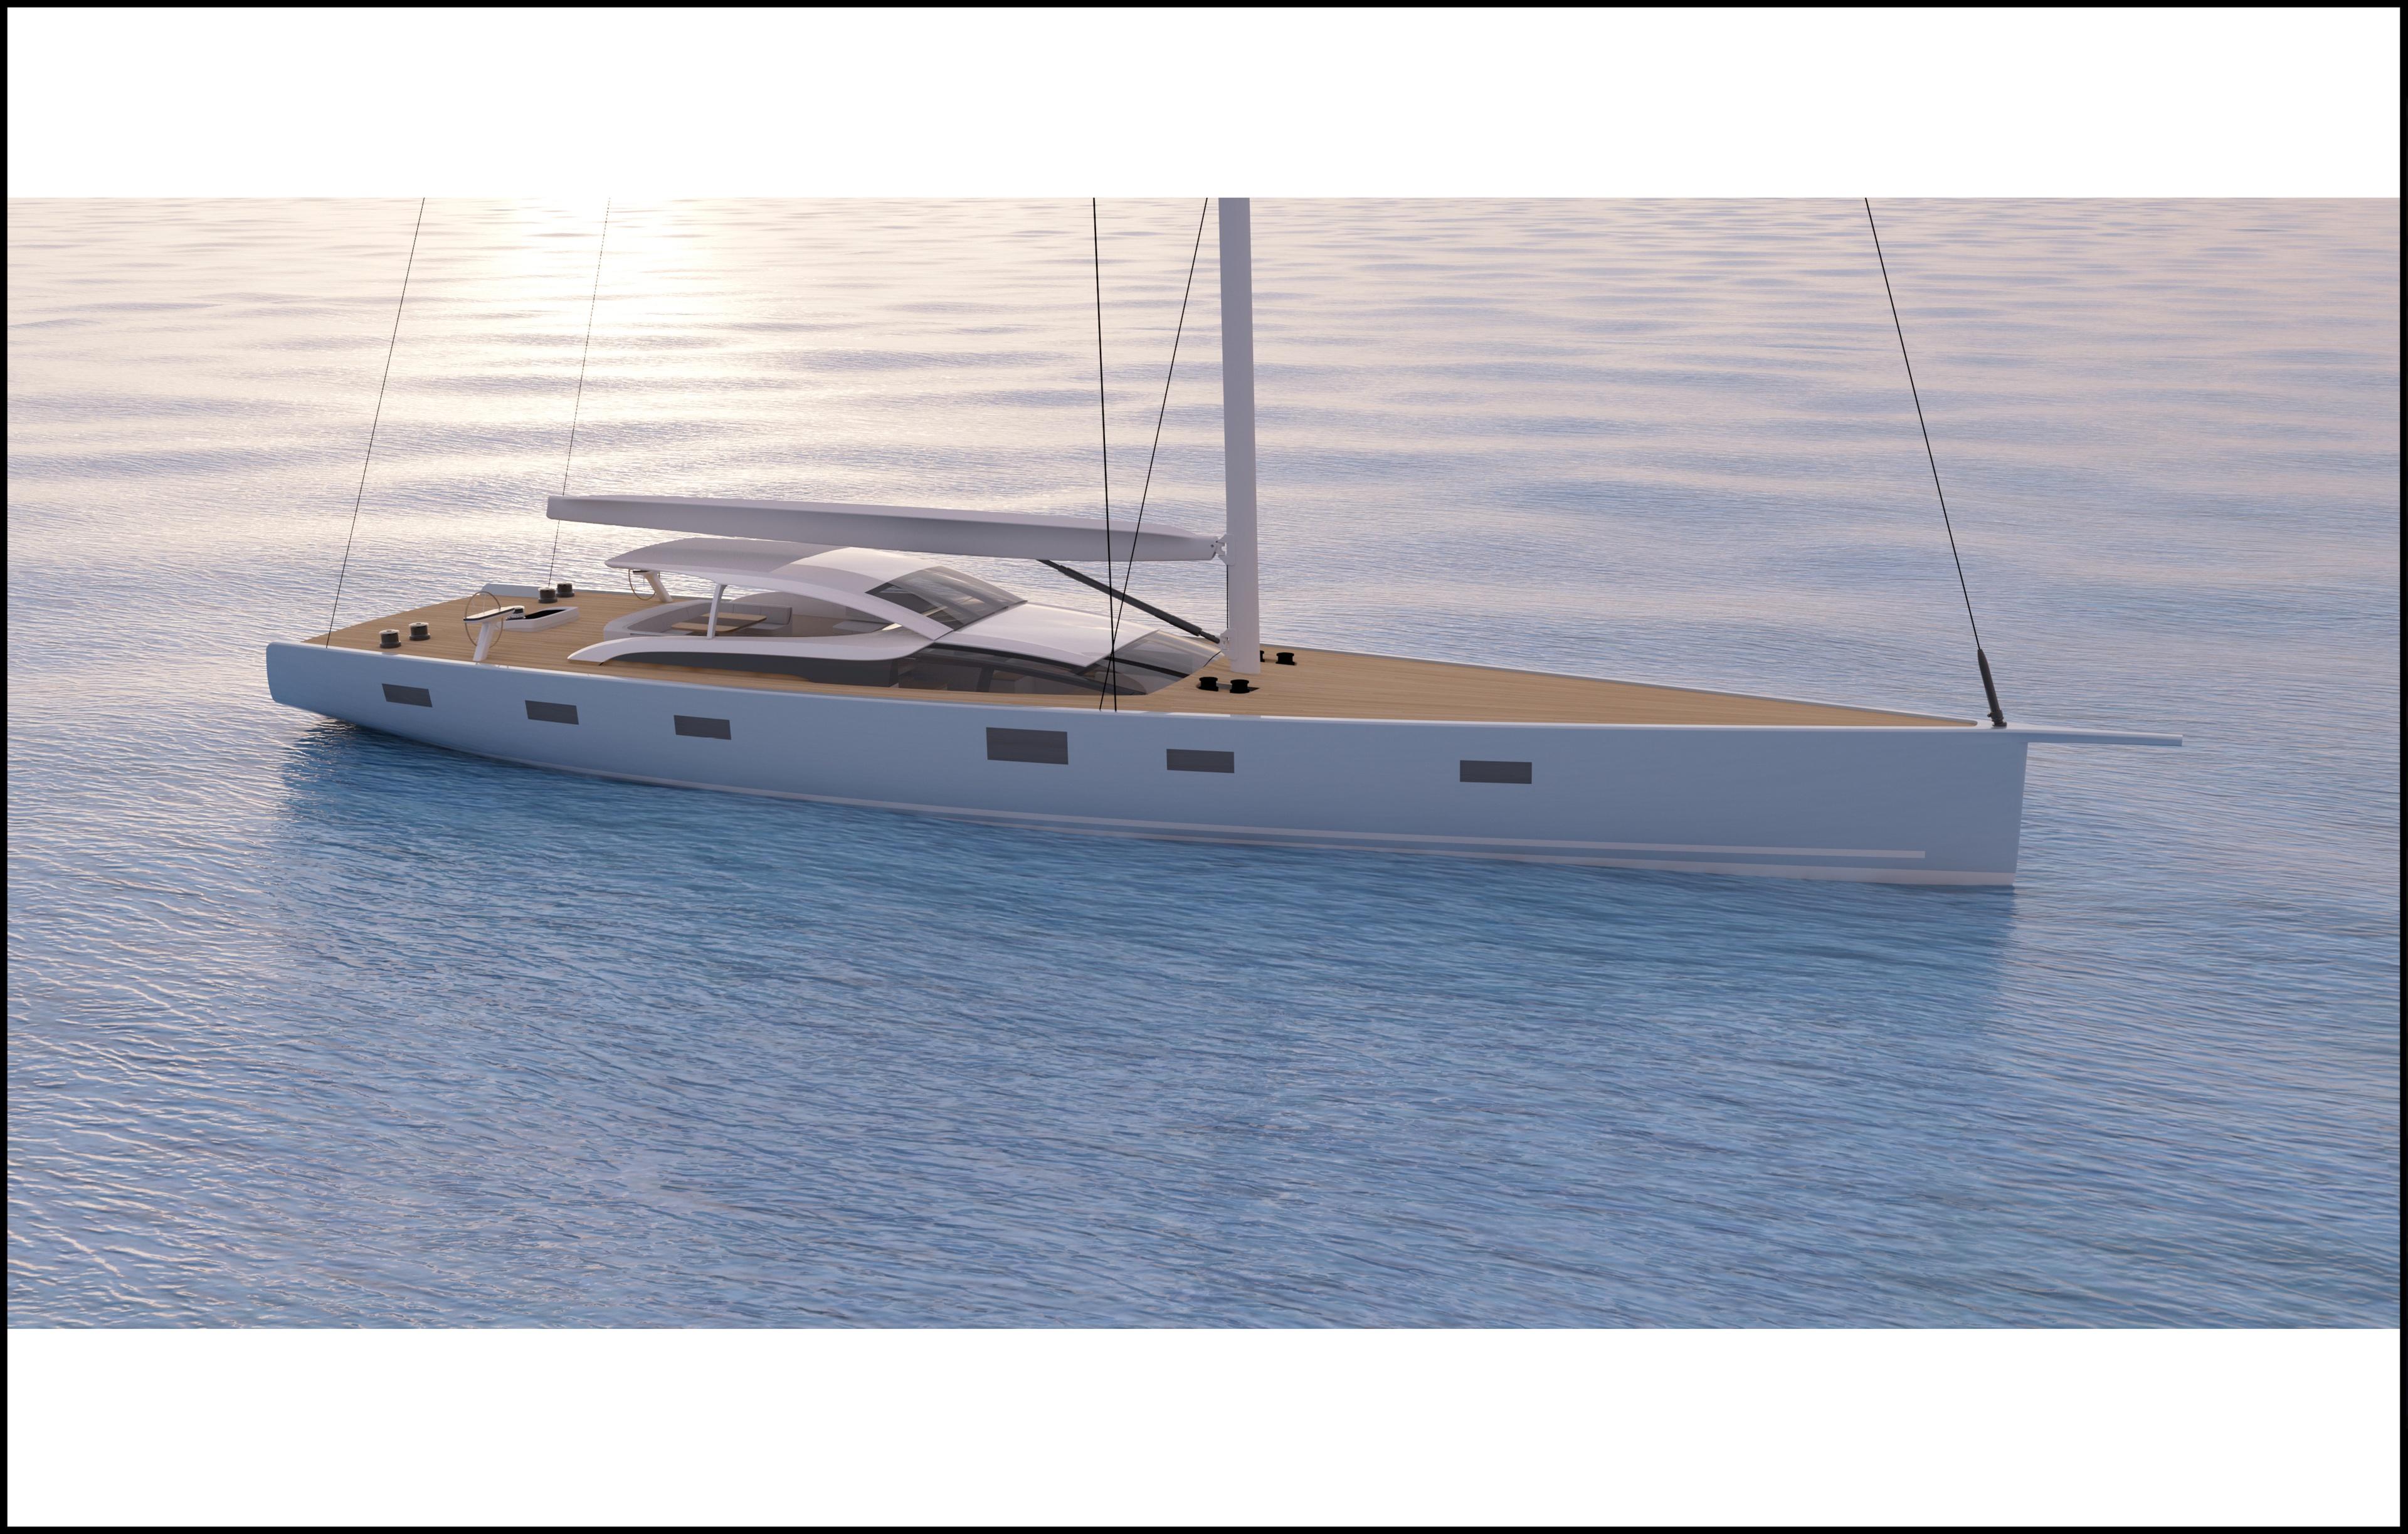 Ribelle at Loro Piana Superyacht Regatta